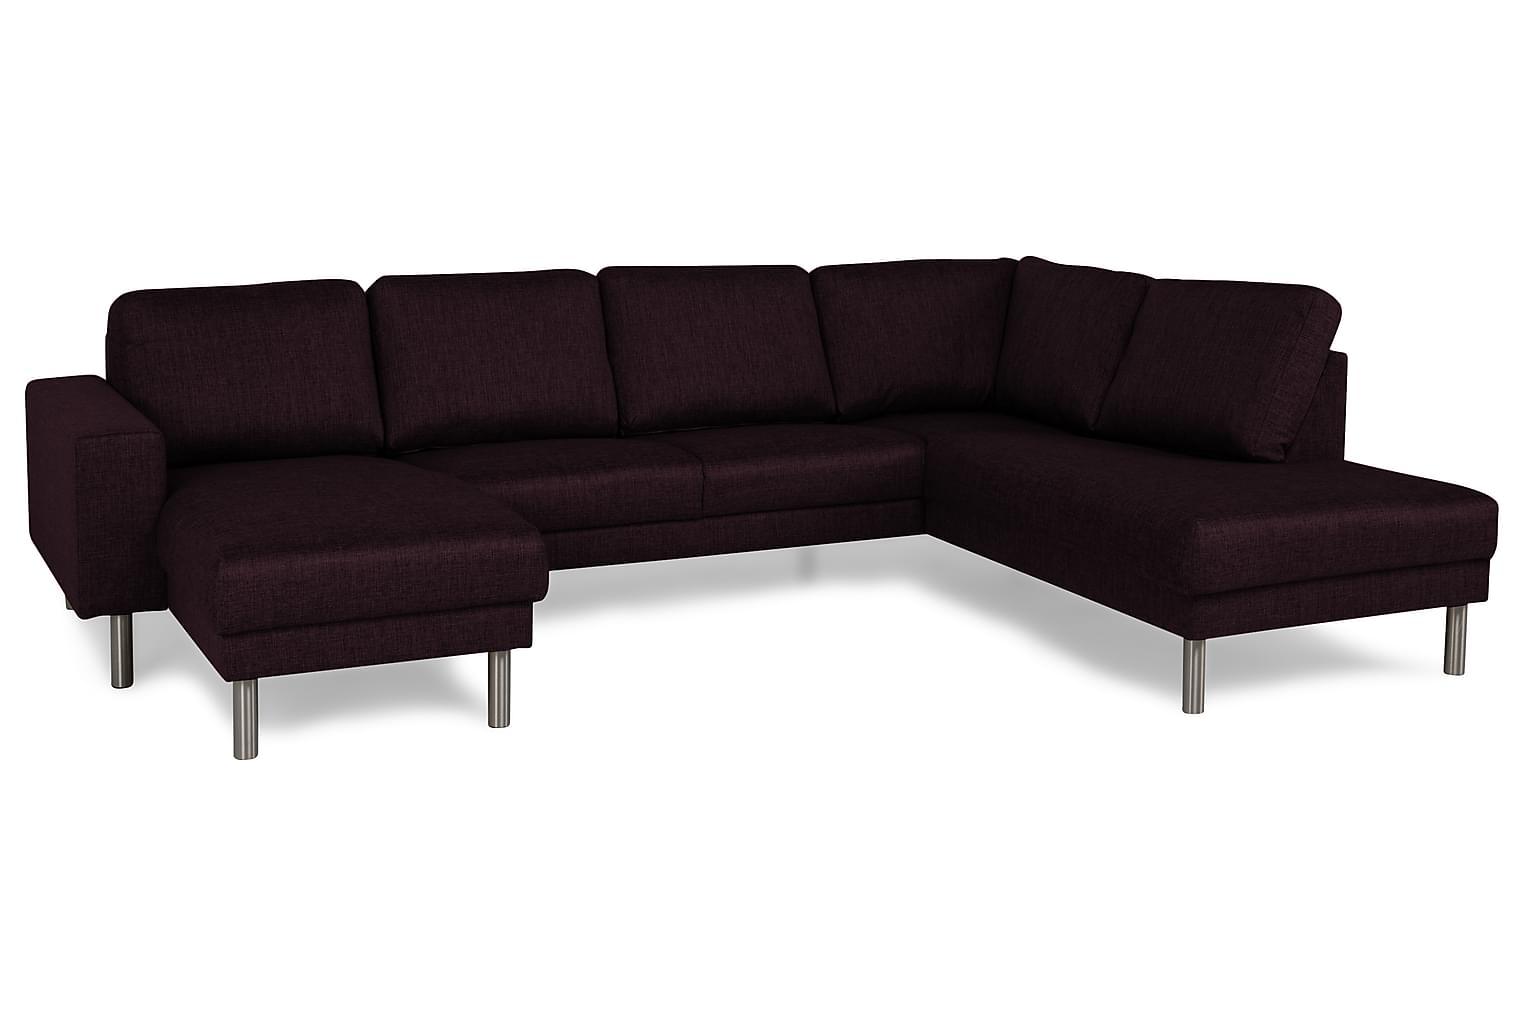 sofa lilla - Prissøk - Gir deg laveste pris